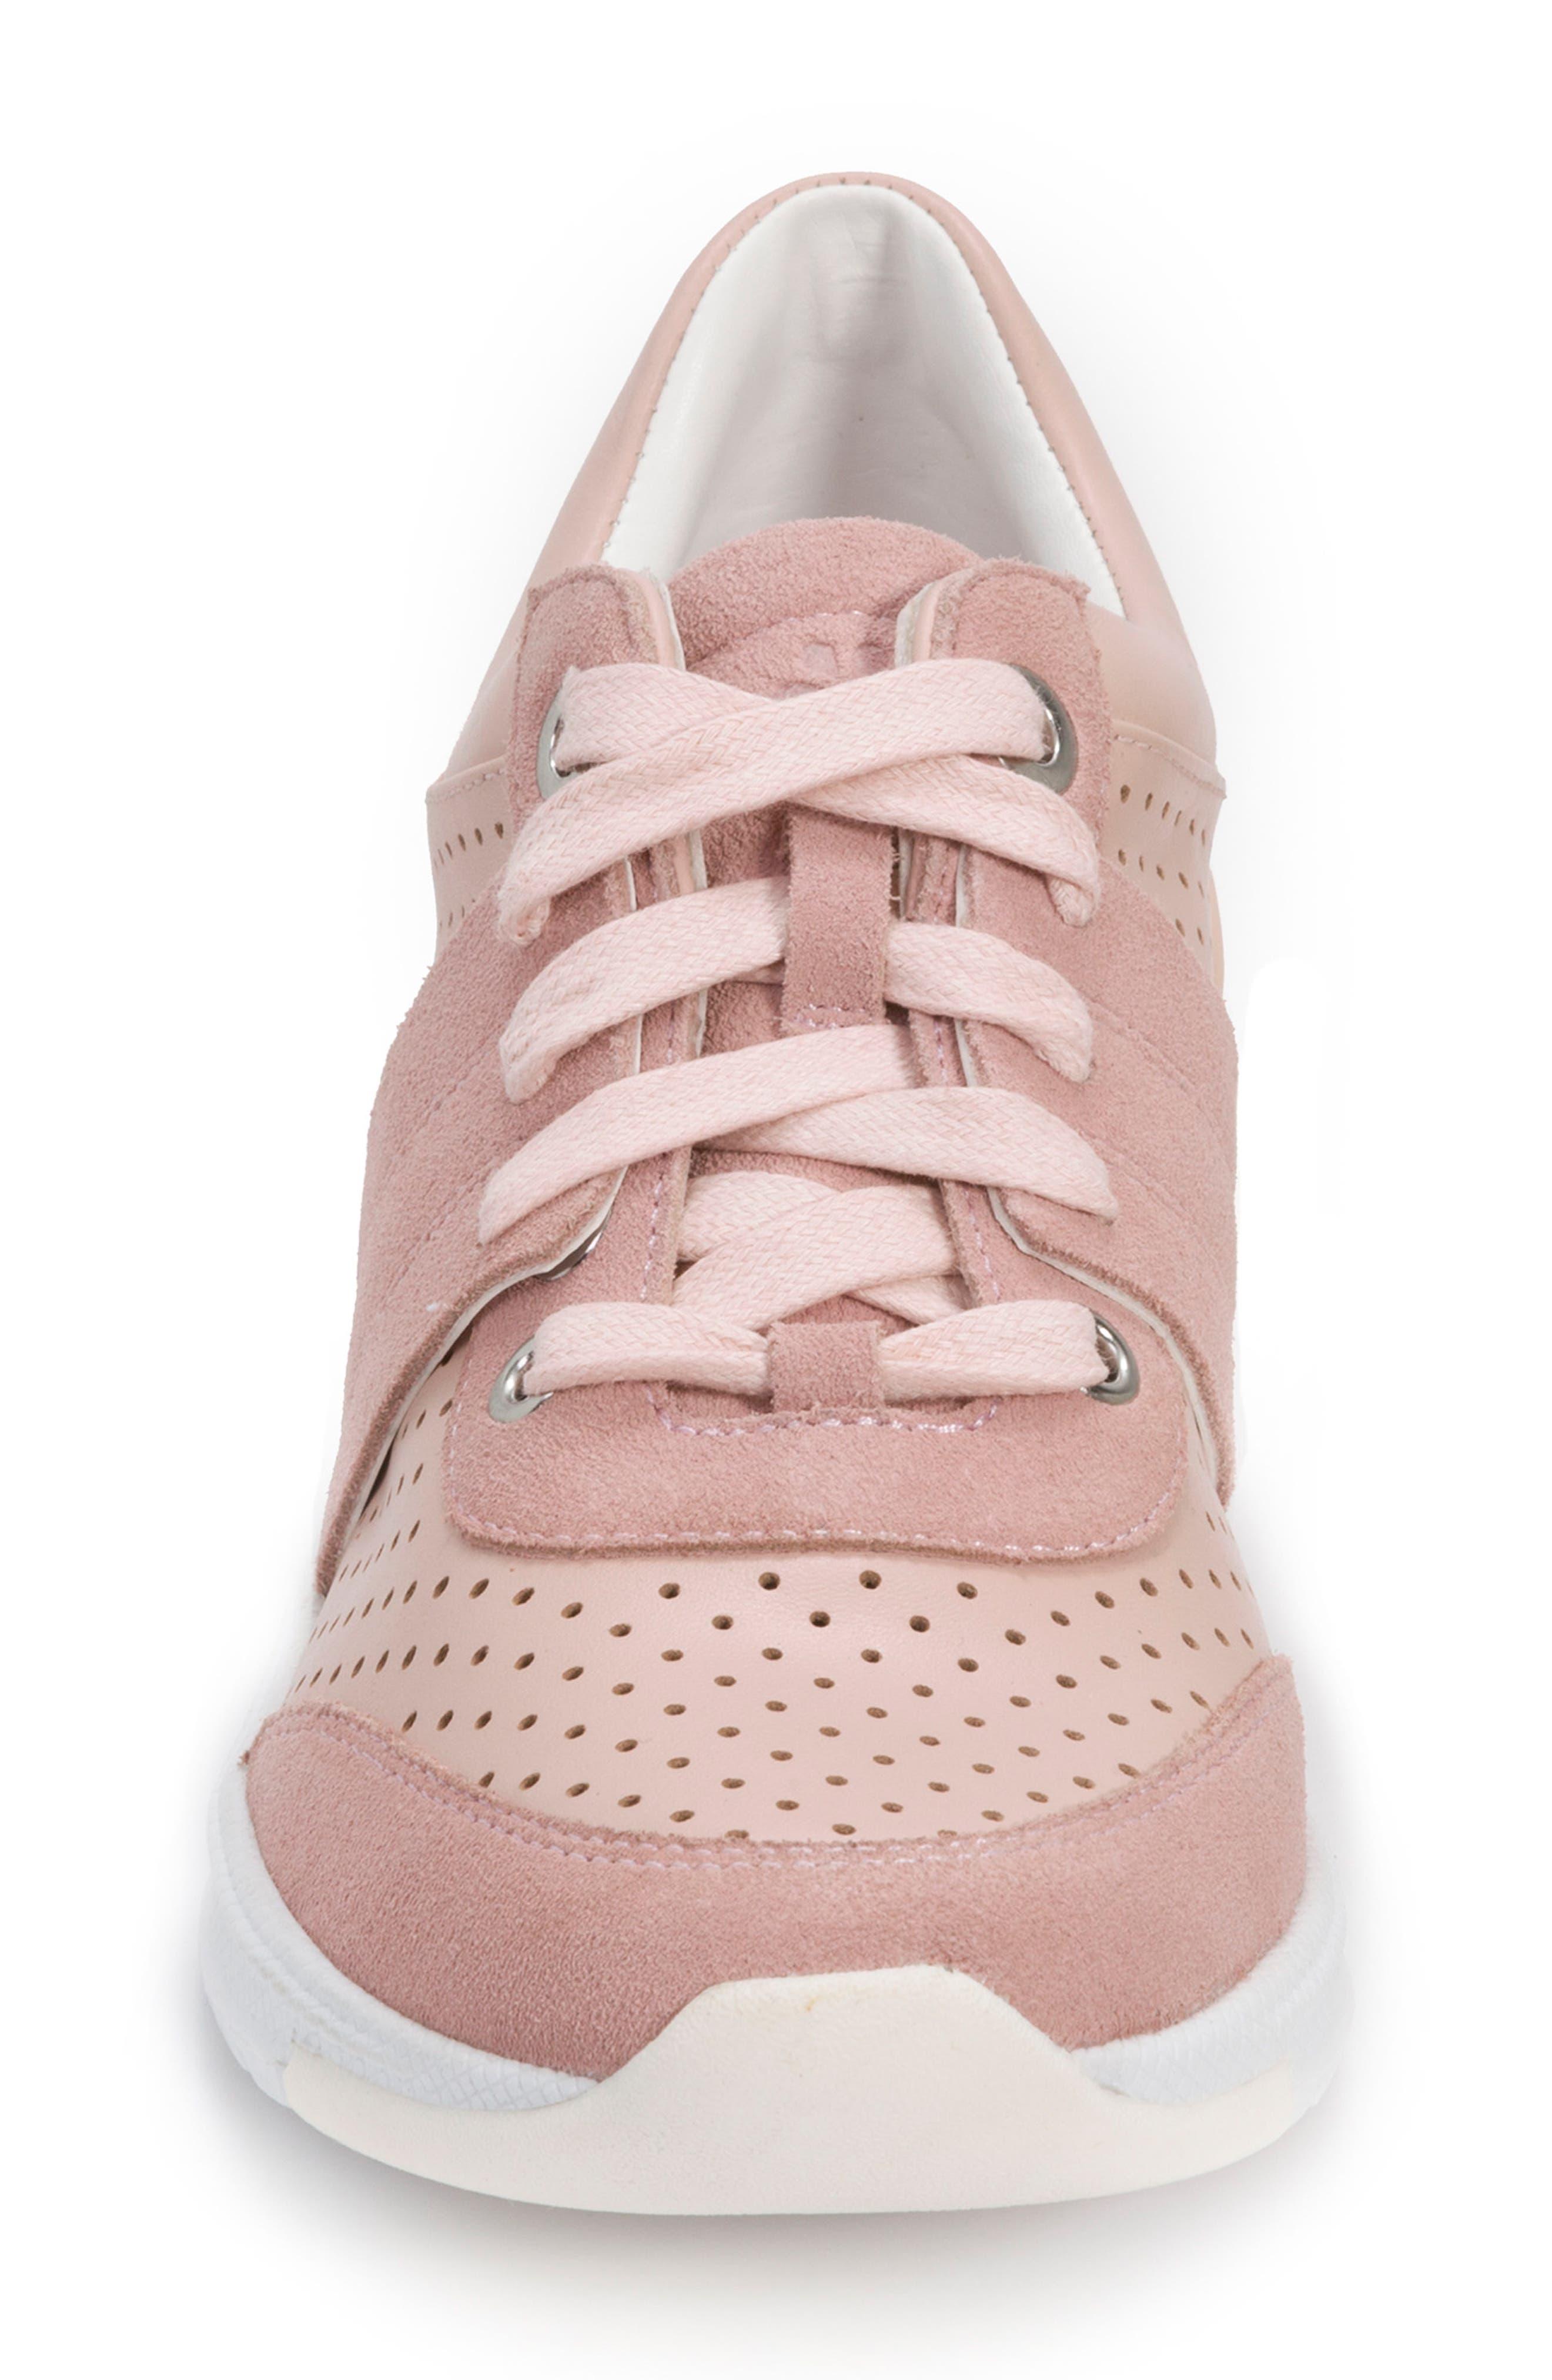 Bea Sneaker,                             Alternate thumbnail 4, color,                             Blush Leather